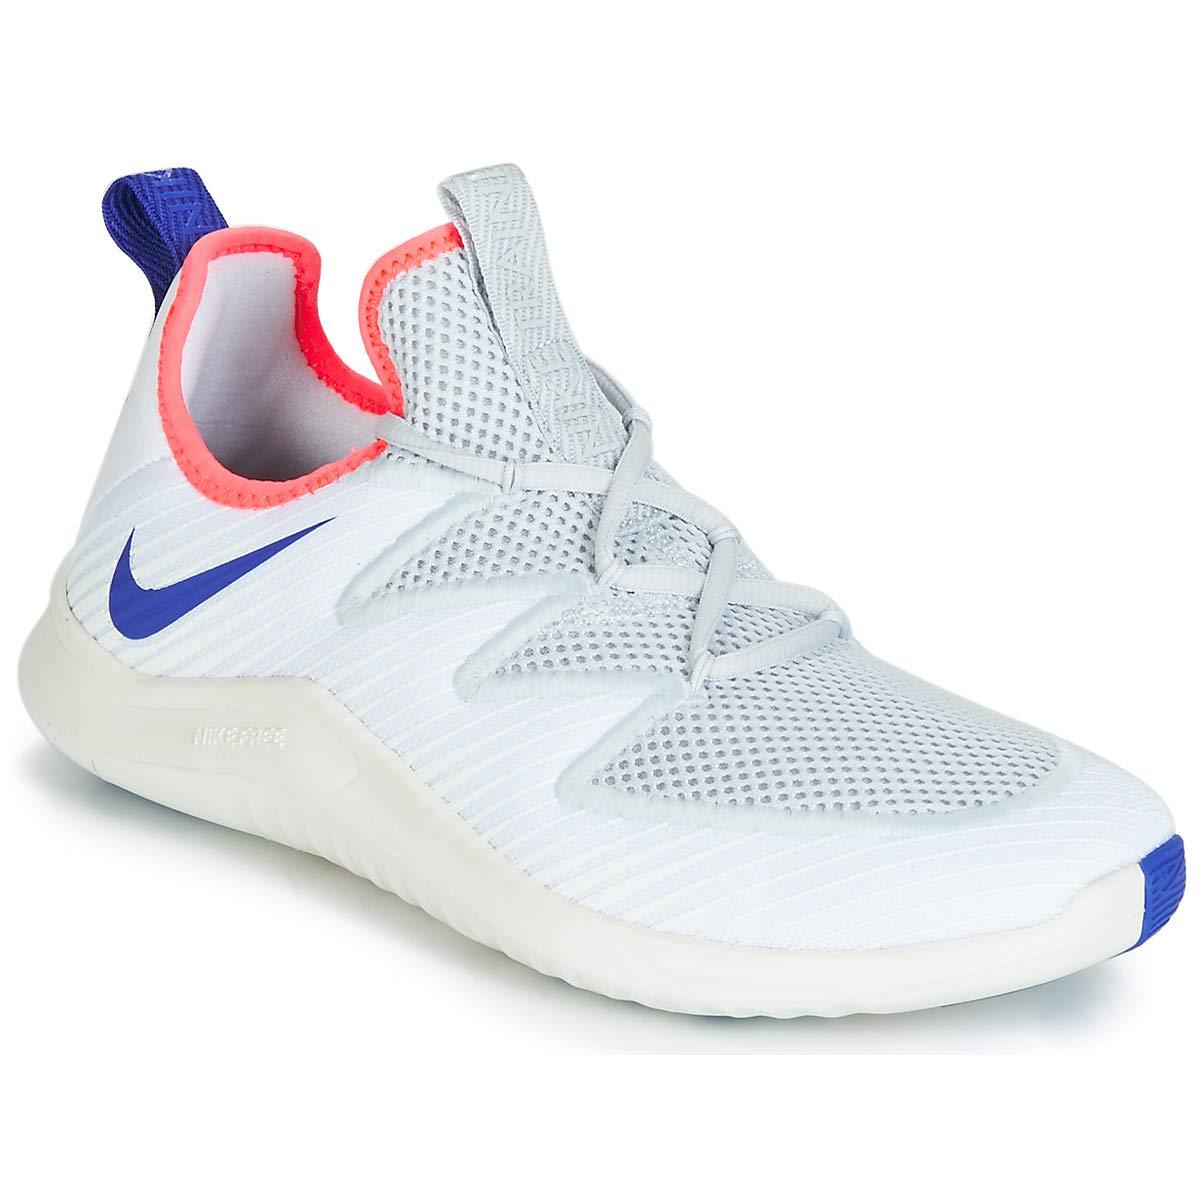 Mehrfarbig (Weiß  Racer Blau  Pure Platinum 160) Nike Herren Free Tr Ultra Fitnessschuhe, Schwarz